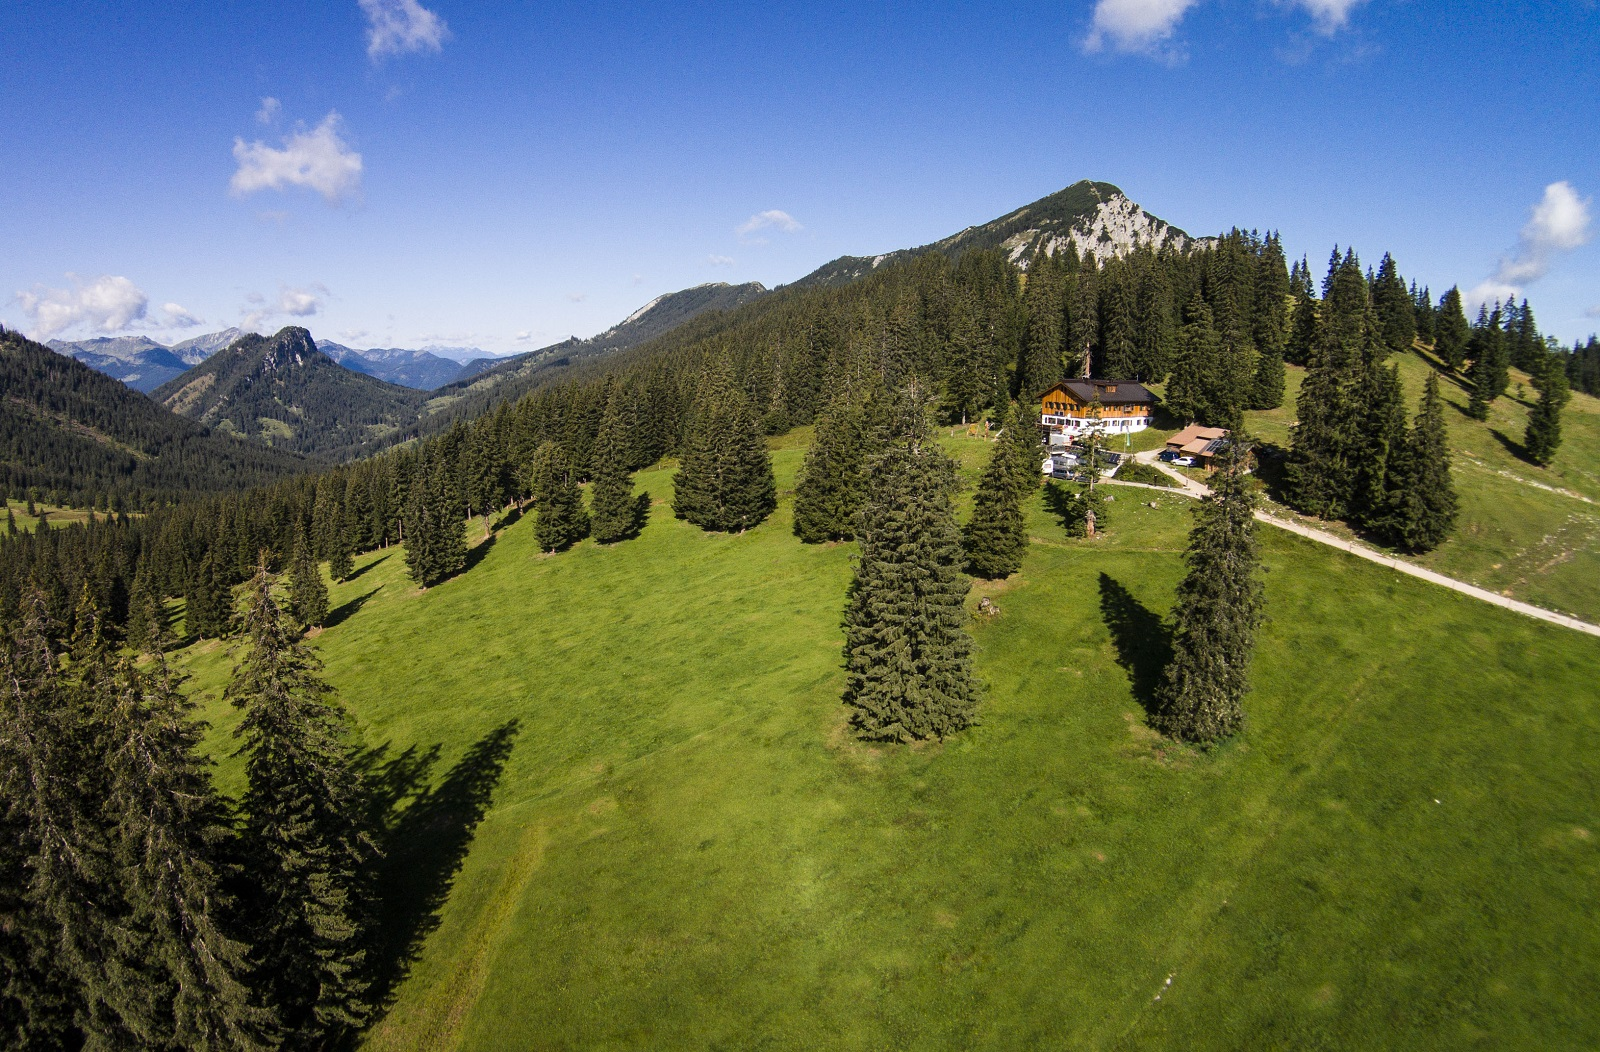 Hütte, Berge, Berglandlandschaft